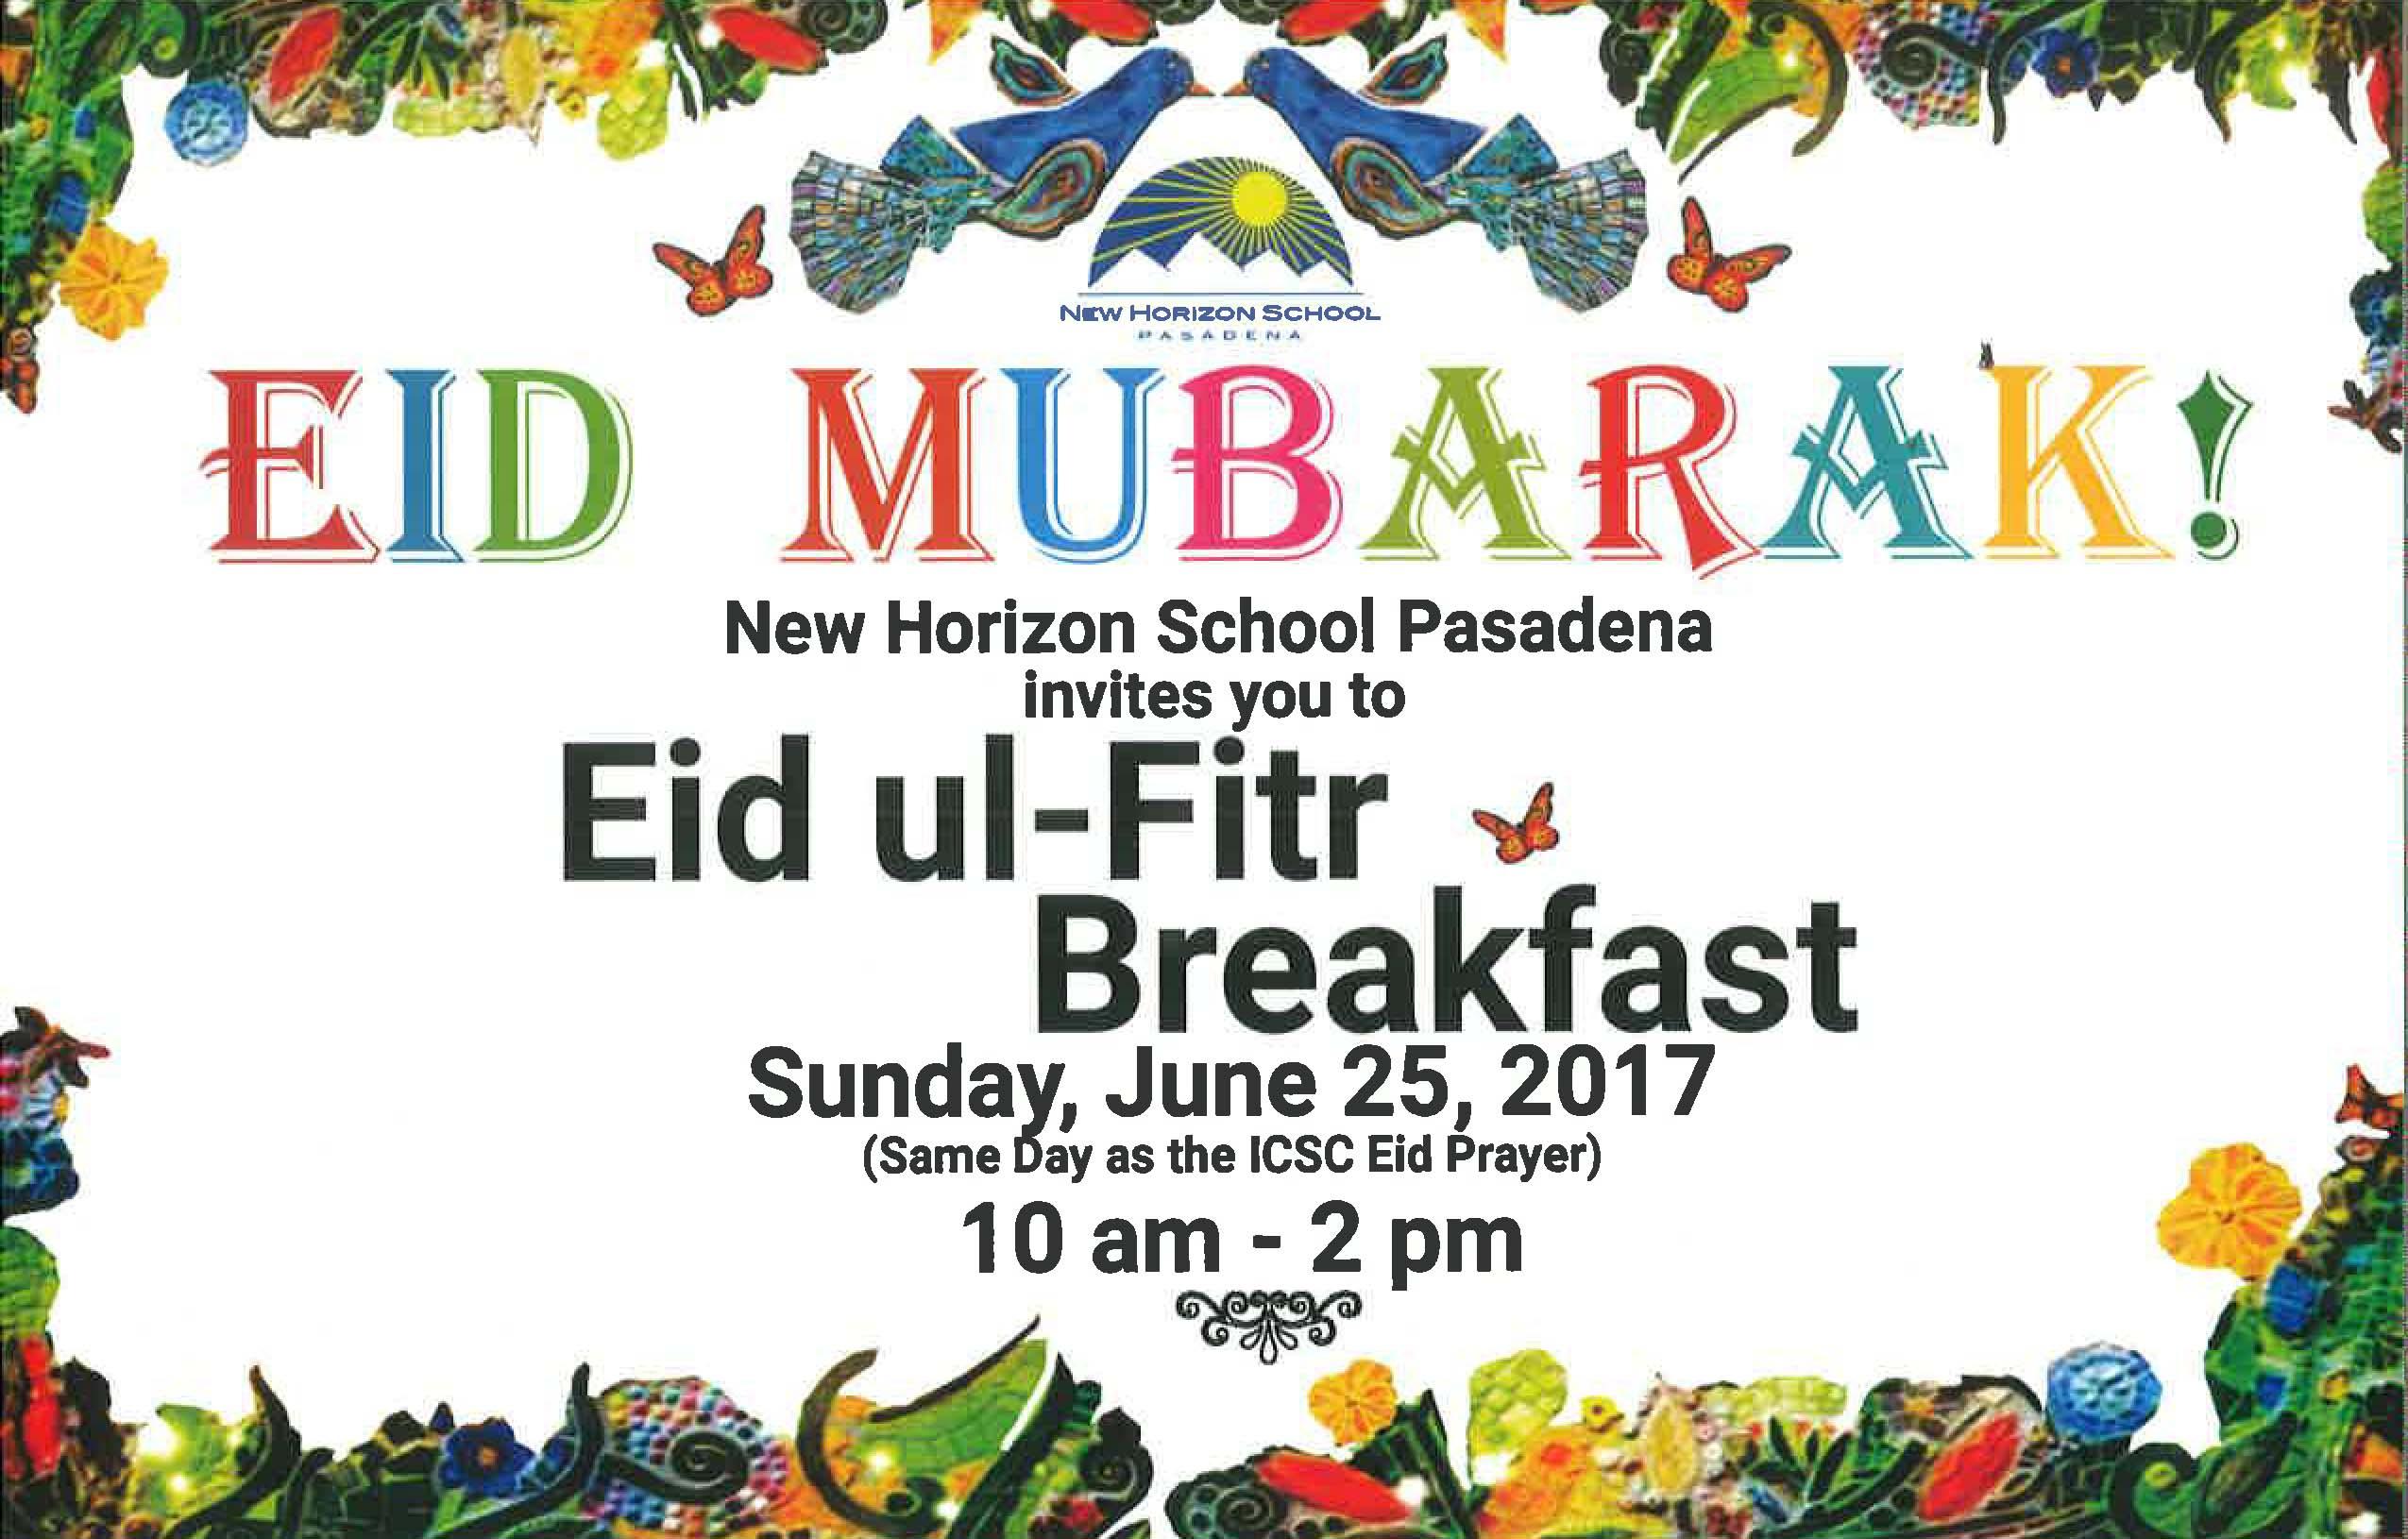 Most Inspiring School Eid Al-Fitr 2018 - Eid-Front  Graphic_546855 .jpg